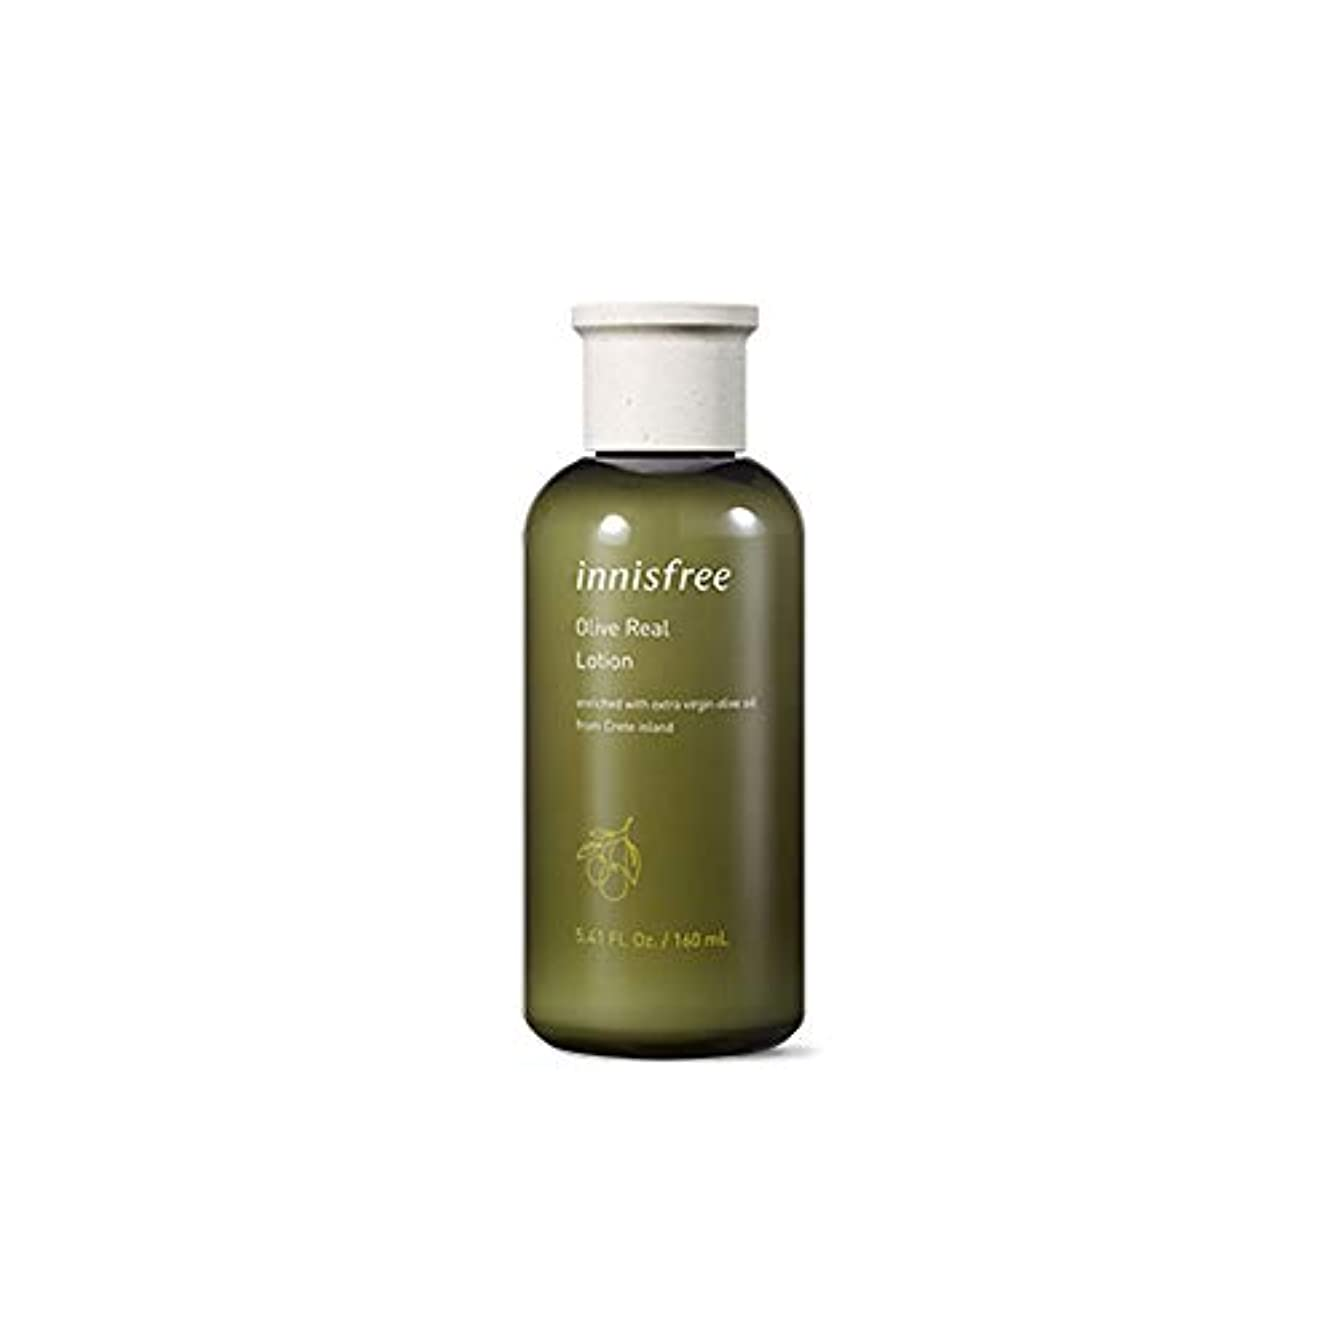 NEW[イニスフリー] Innisfree オリーブリアルローション乳液EX(160ml) Innisfree Olive Real Lotion(160ml)EX [海外直送品]